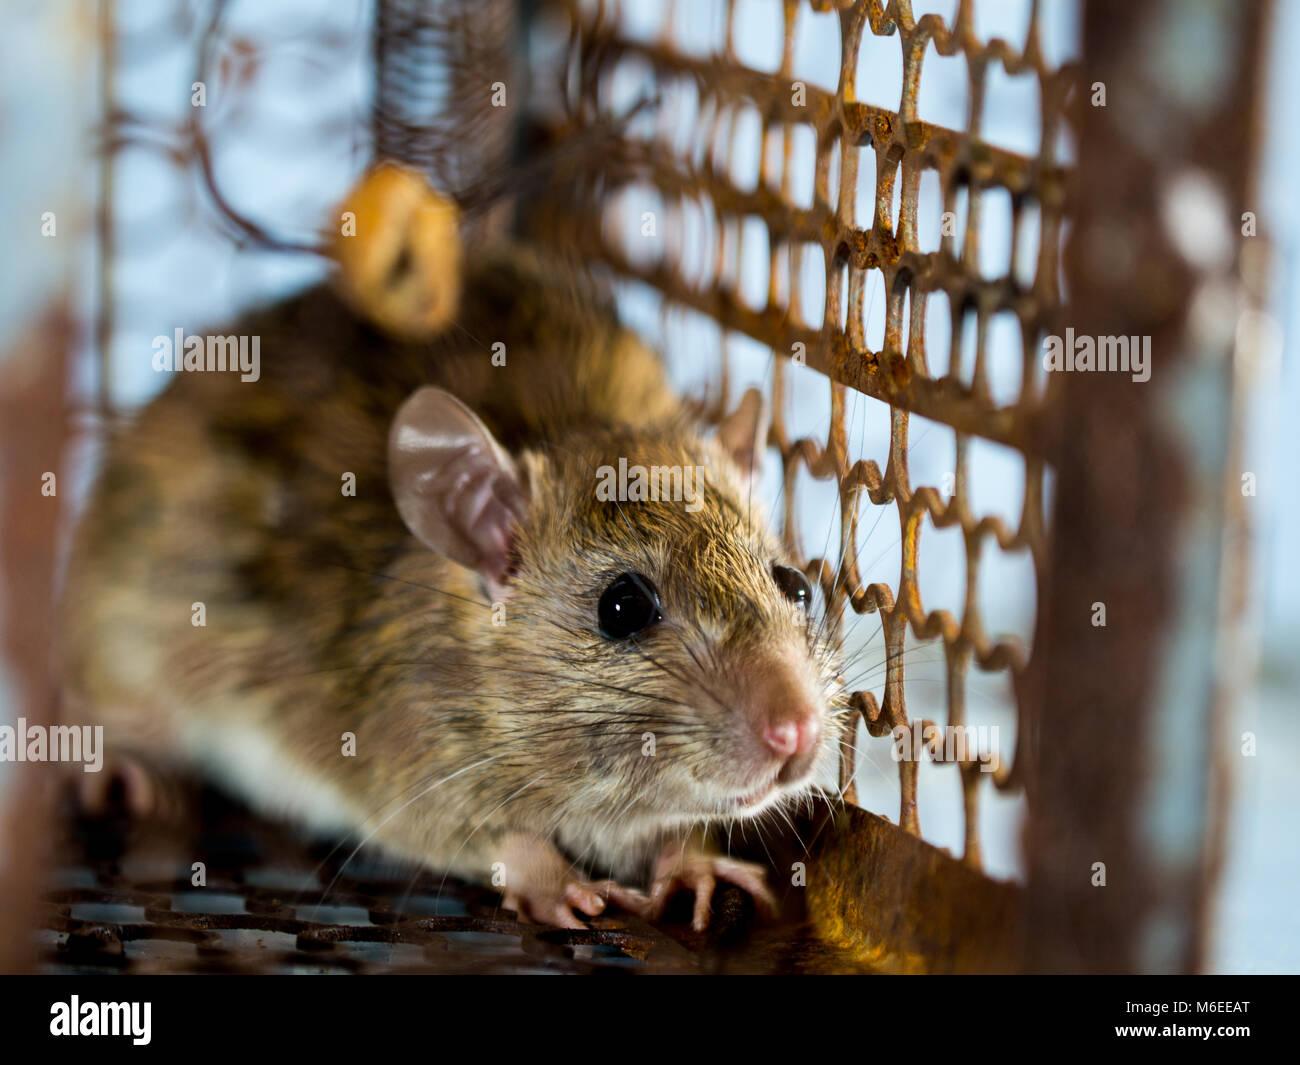 Como atrapar una rata elegant best excellent simple como cazar una rata with como cazar una - Como atrapar ratones ...